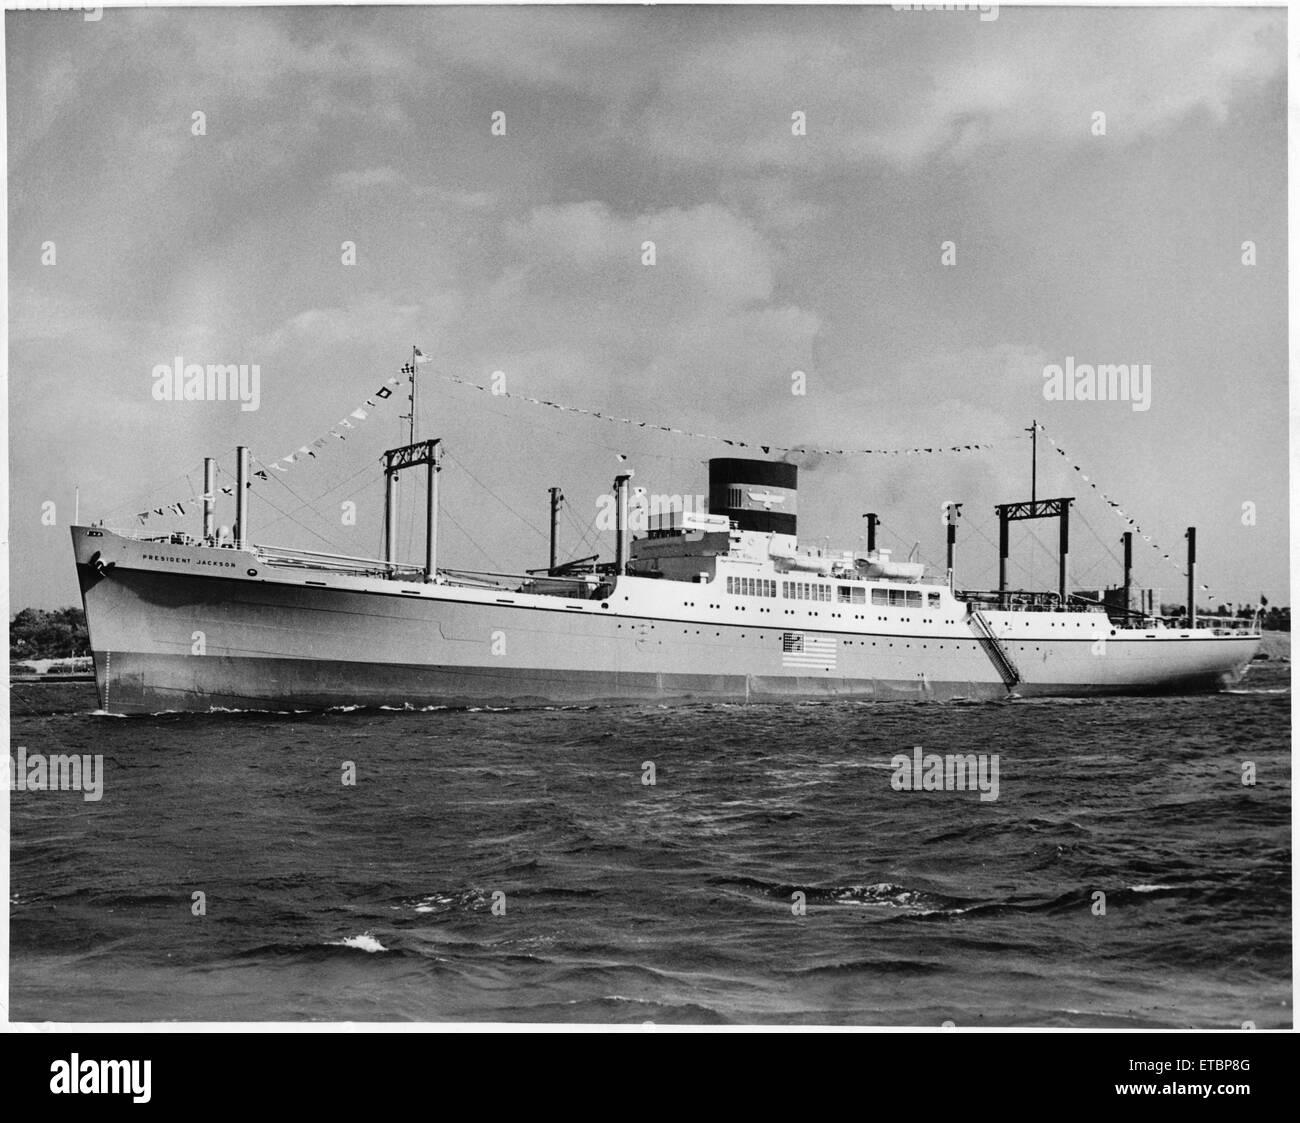 U.S. Naval Ship President Jackson, Circa 1953 - Stock Image